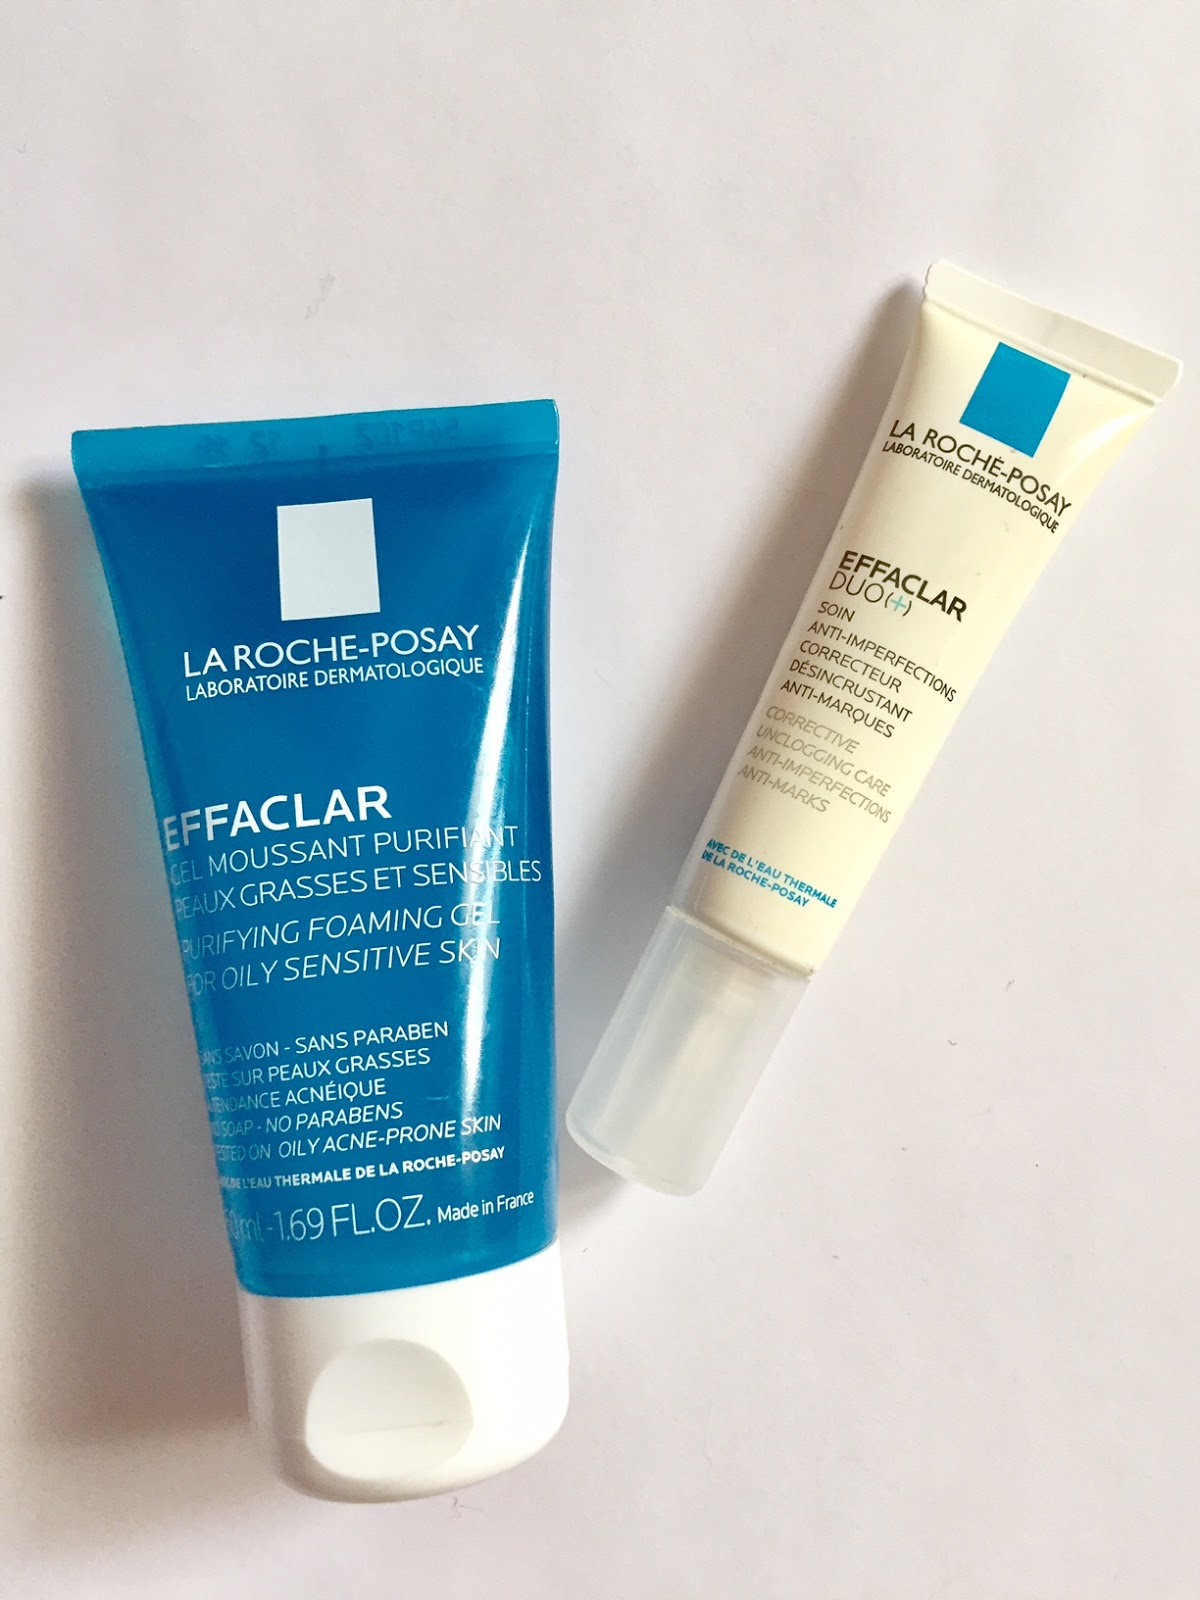 [SKIN CARE] La Roche Posay Effaclar Anti Acne Starter Kit